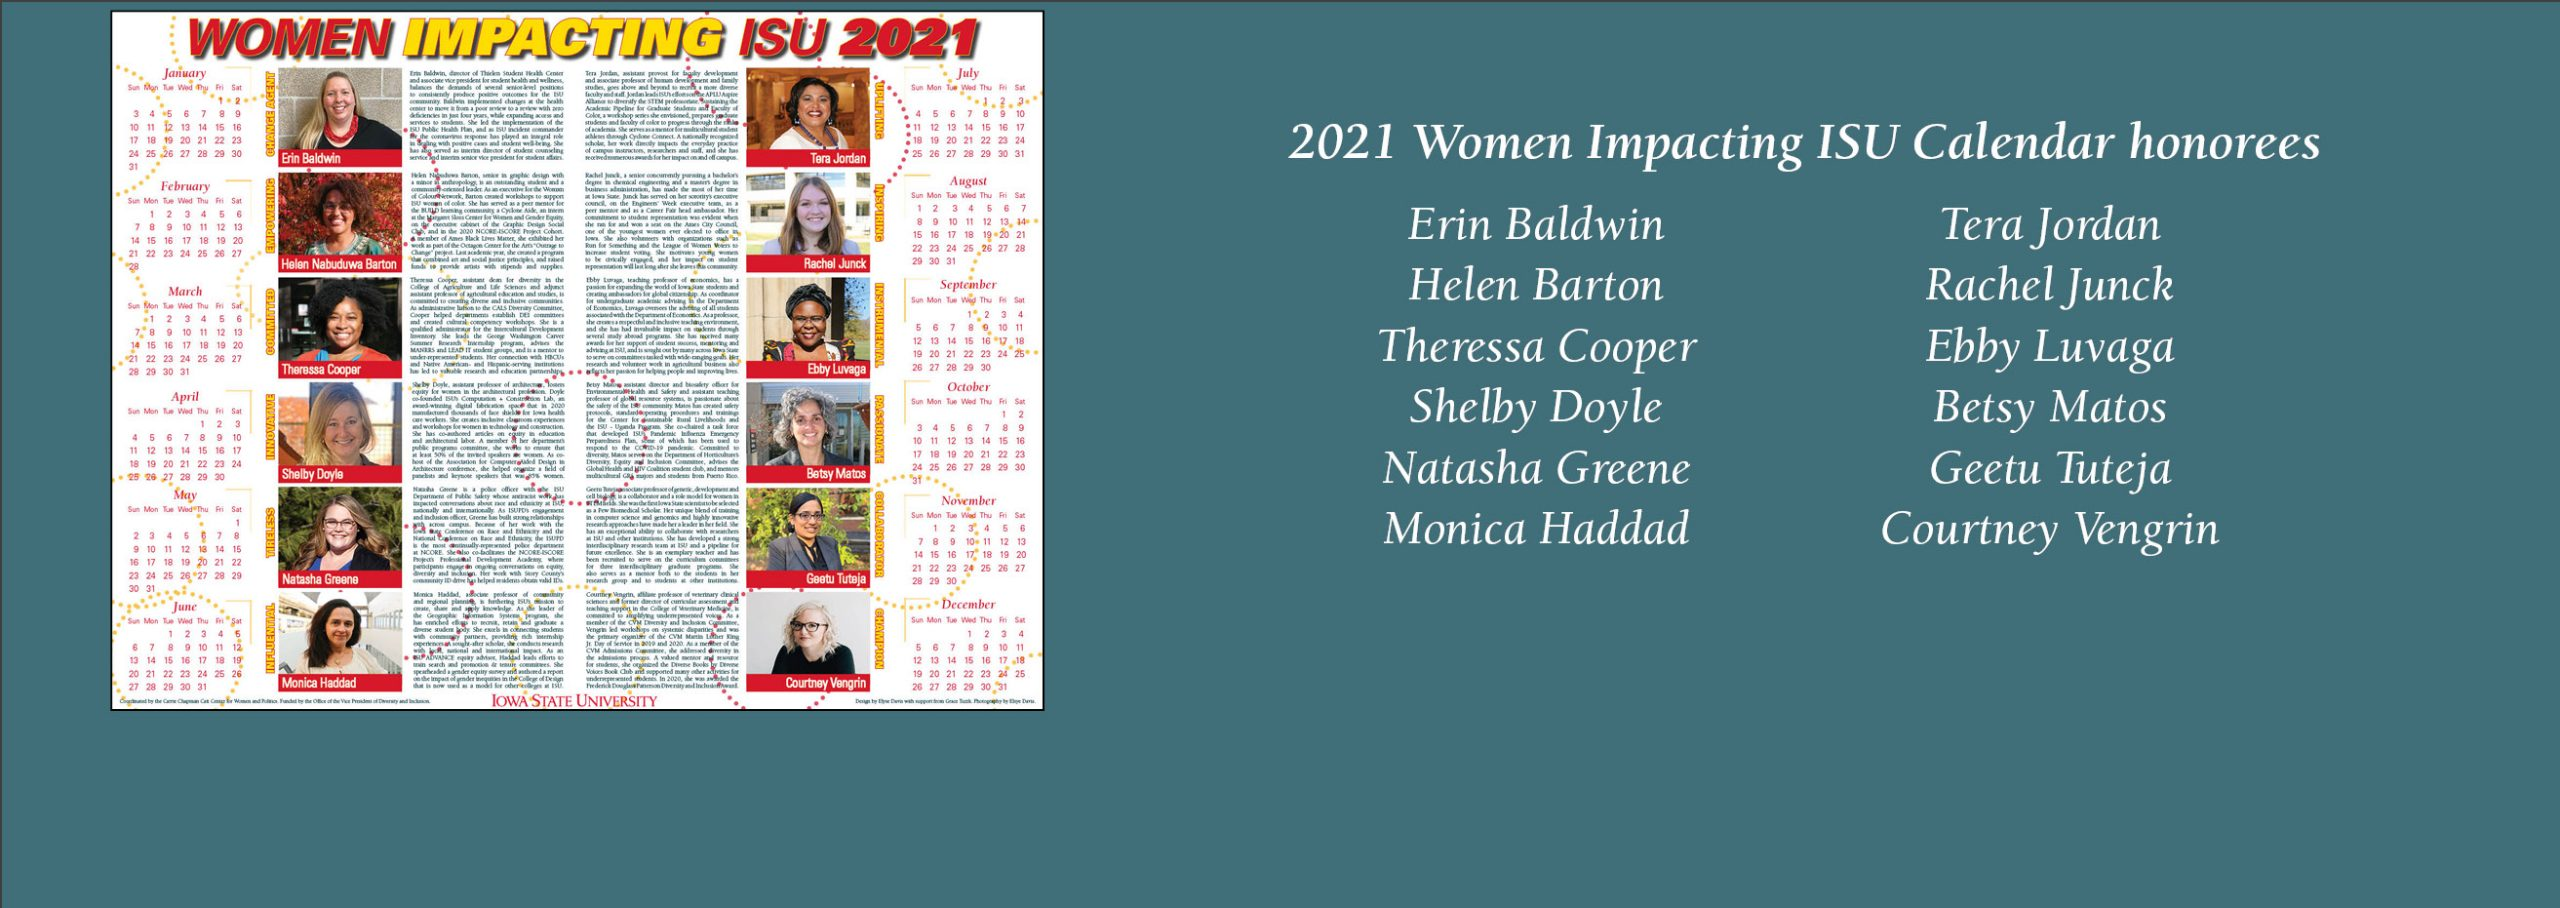 Congratulations to the 2021 Women Impacting ISU Calendar honorees!